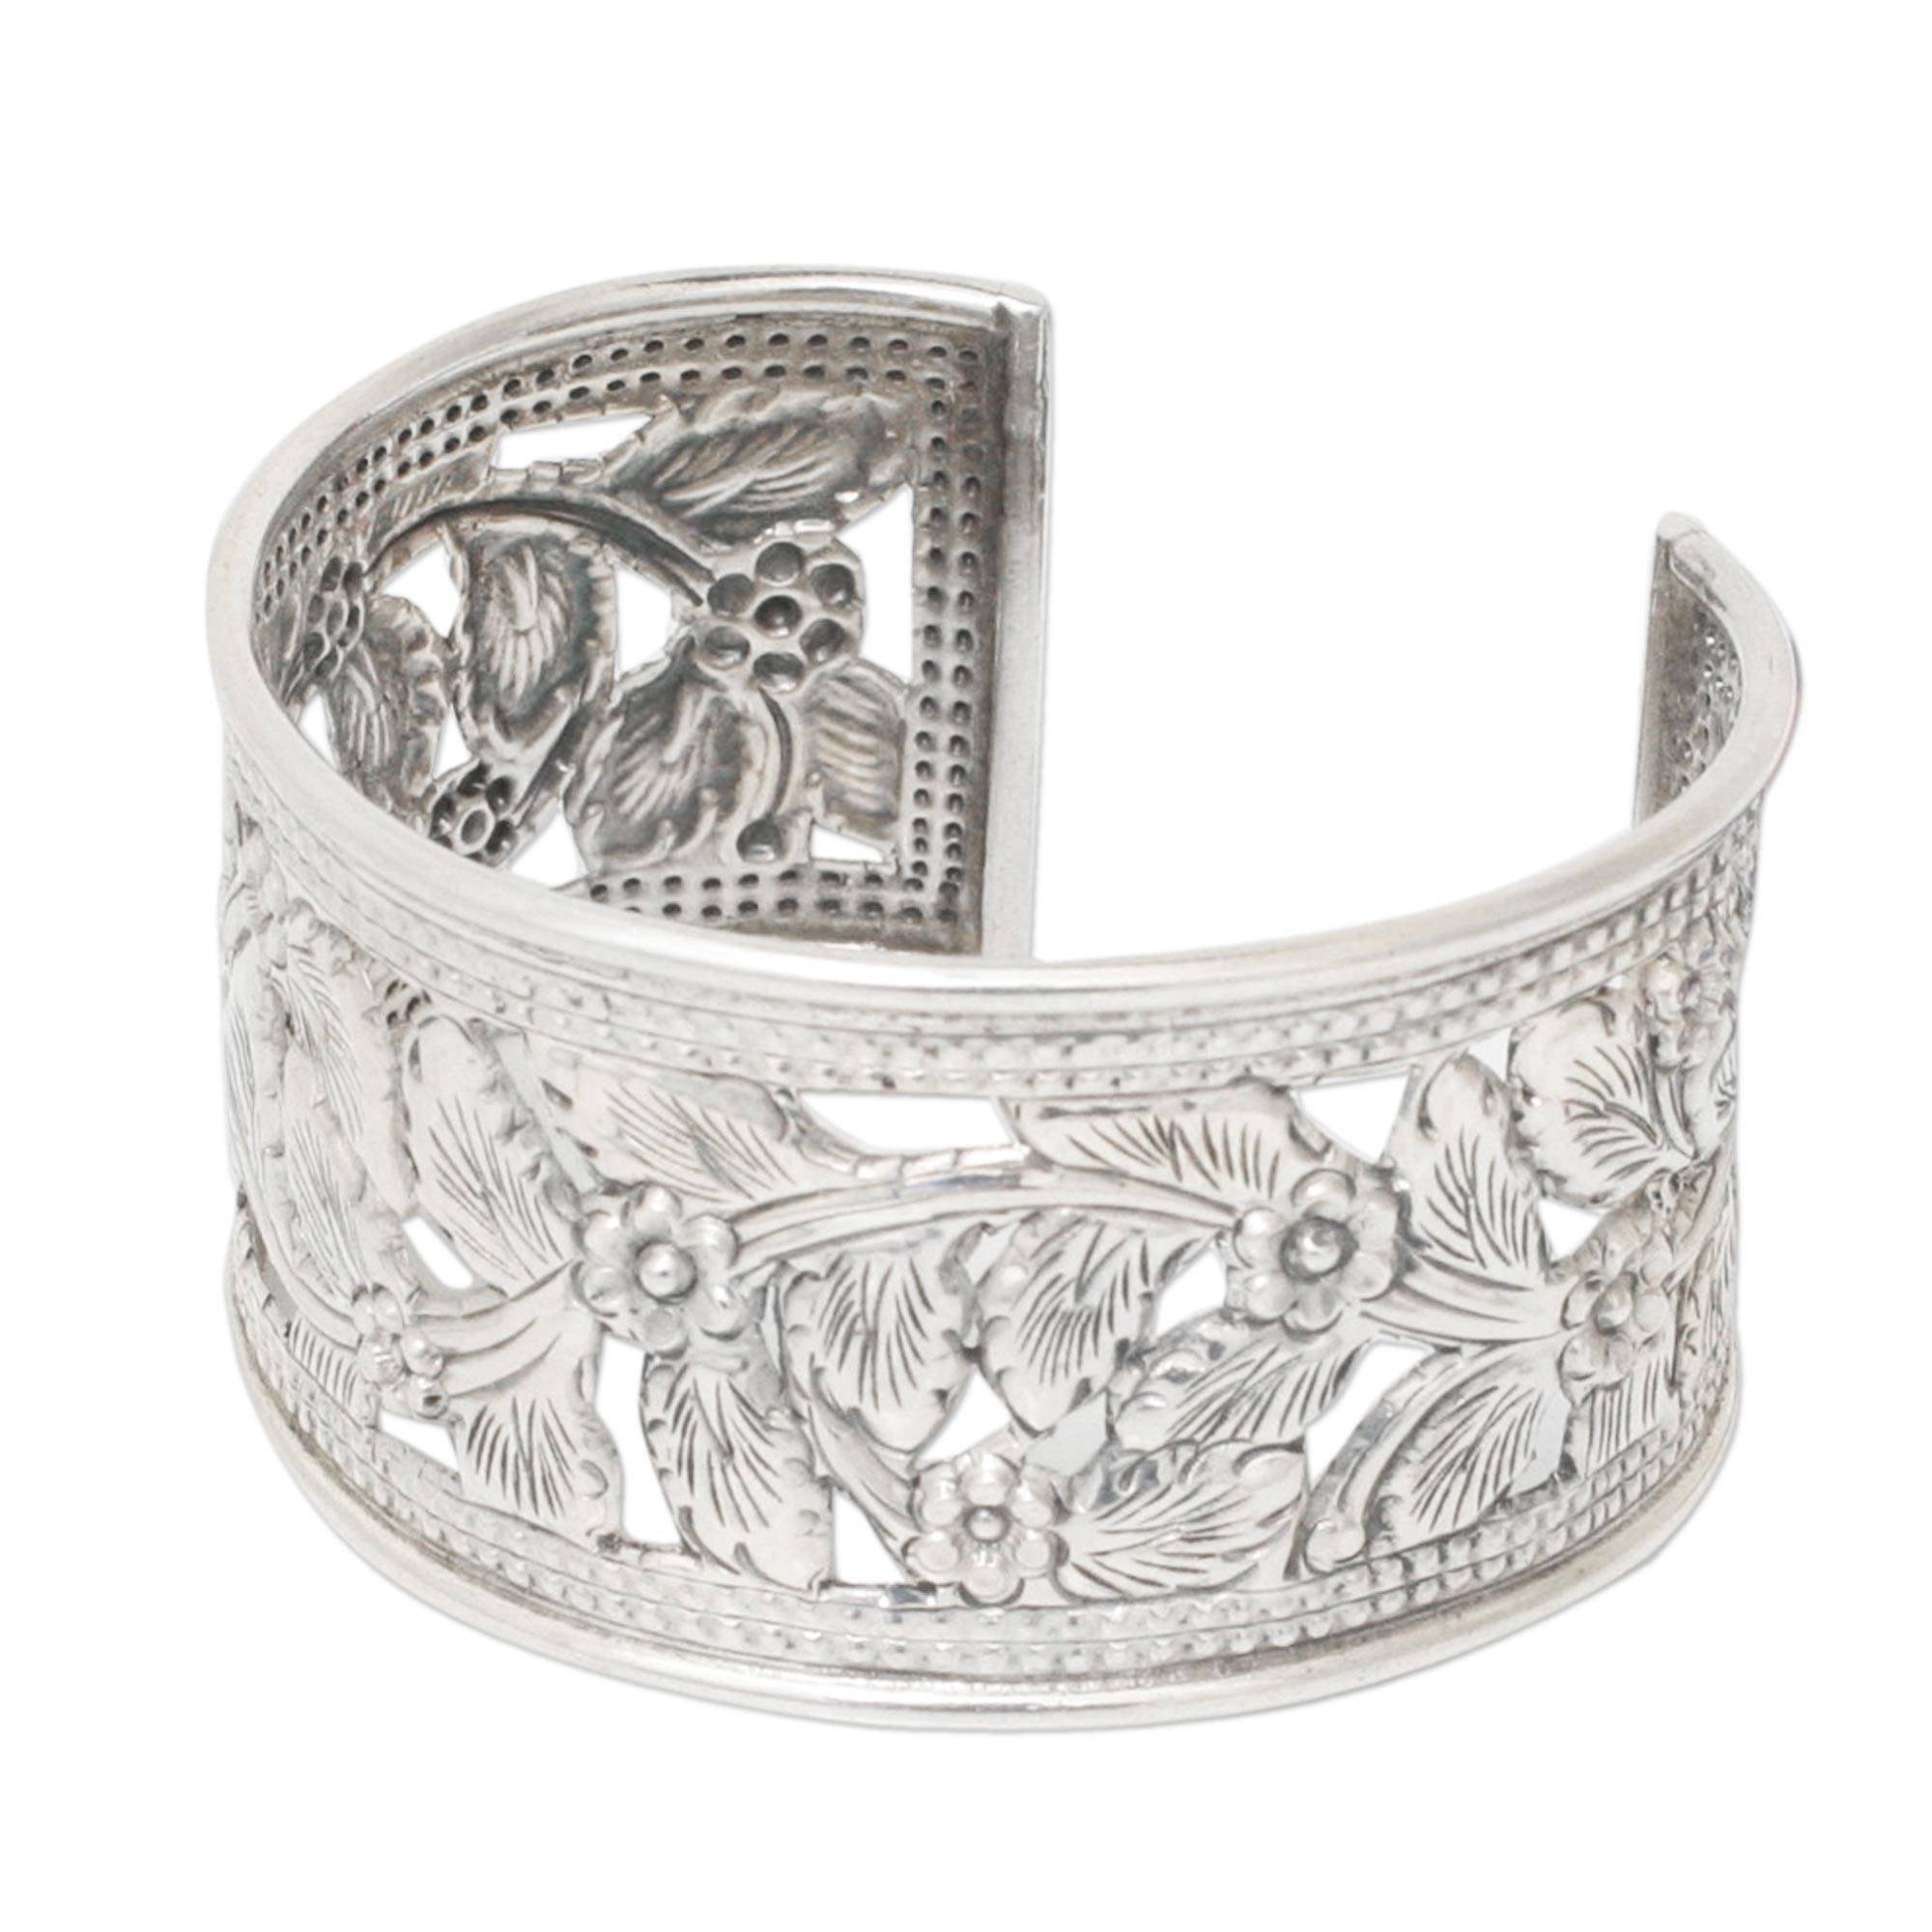 NOVICA .925 Sterling Silver Cuff Bracelet 'Jungle Flower'